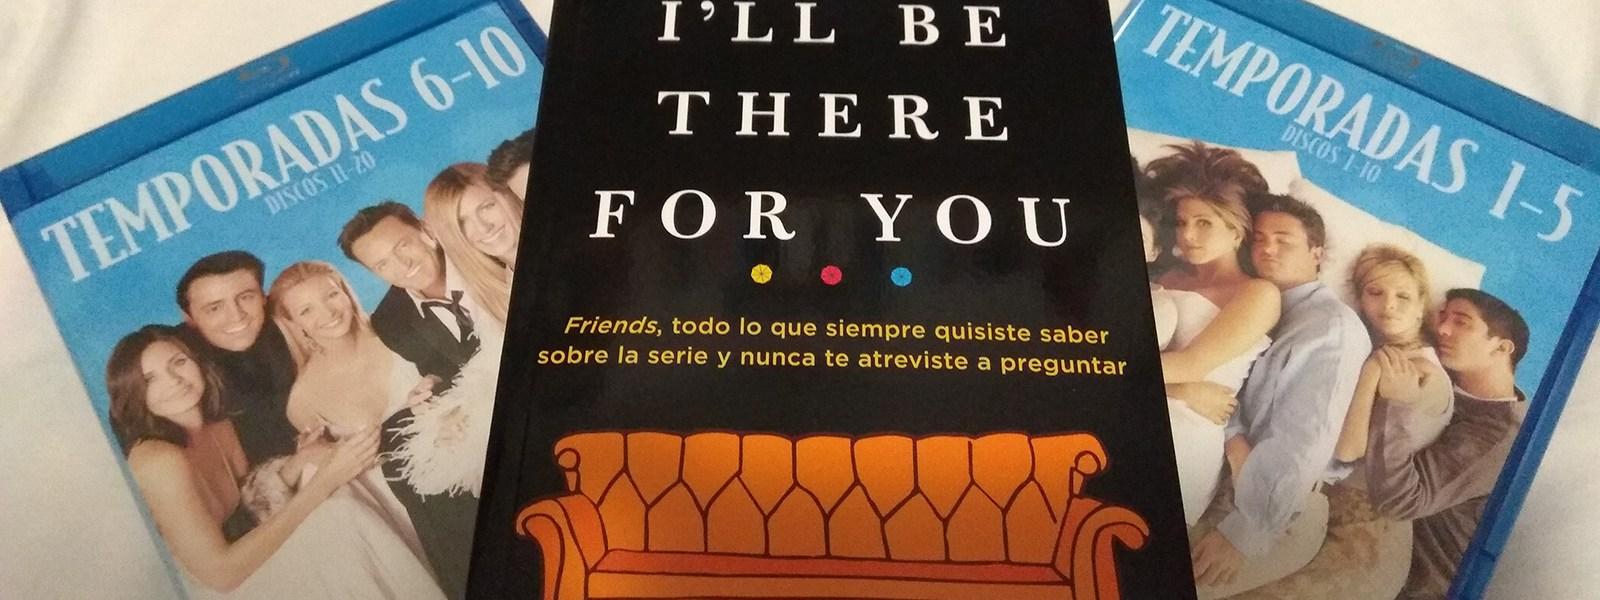 RESEÑA I'LL BE THERE FOR YOU PORTADA - EL PALOMITRÓN